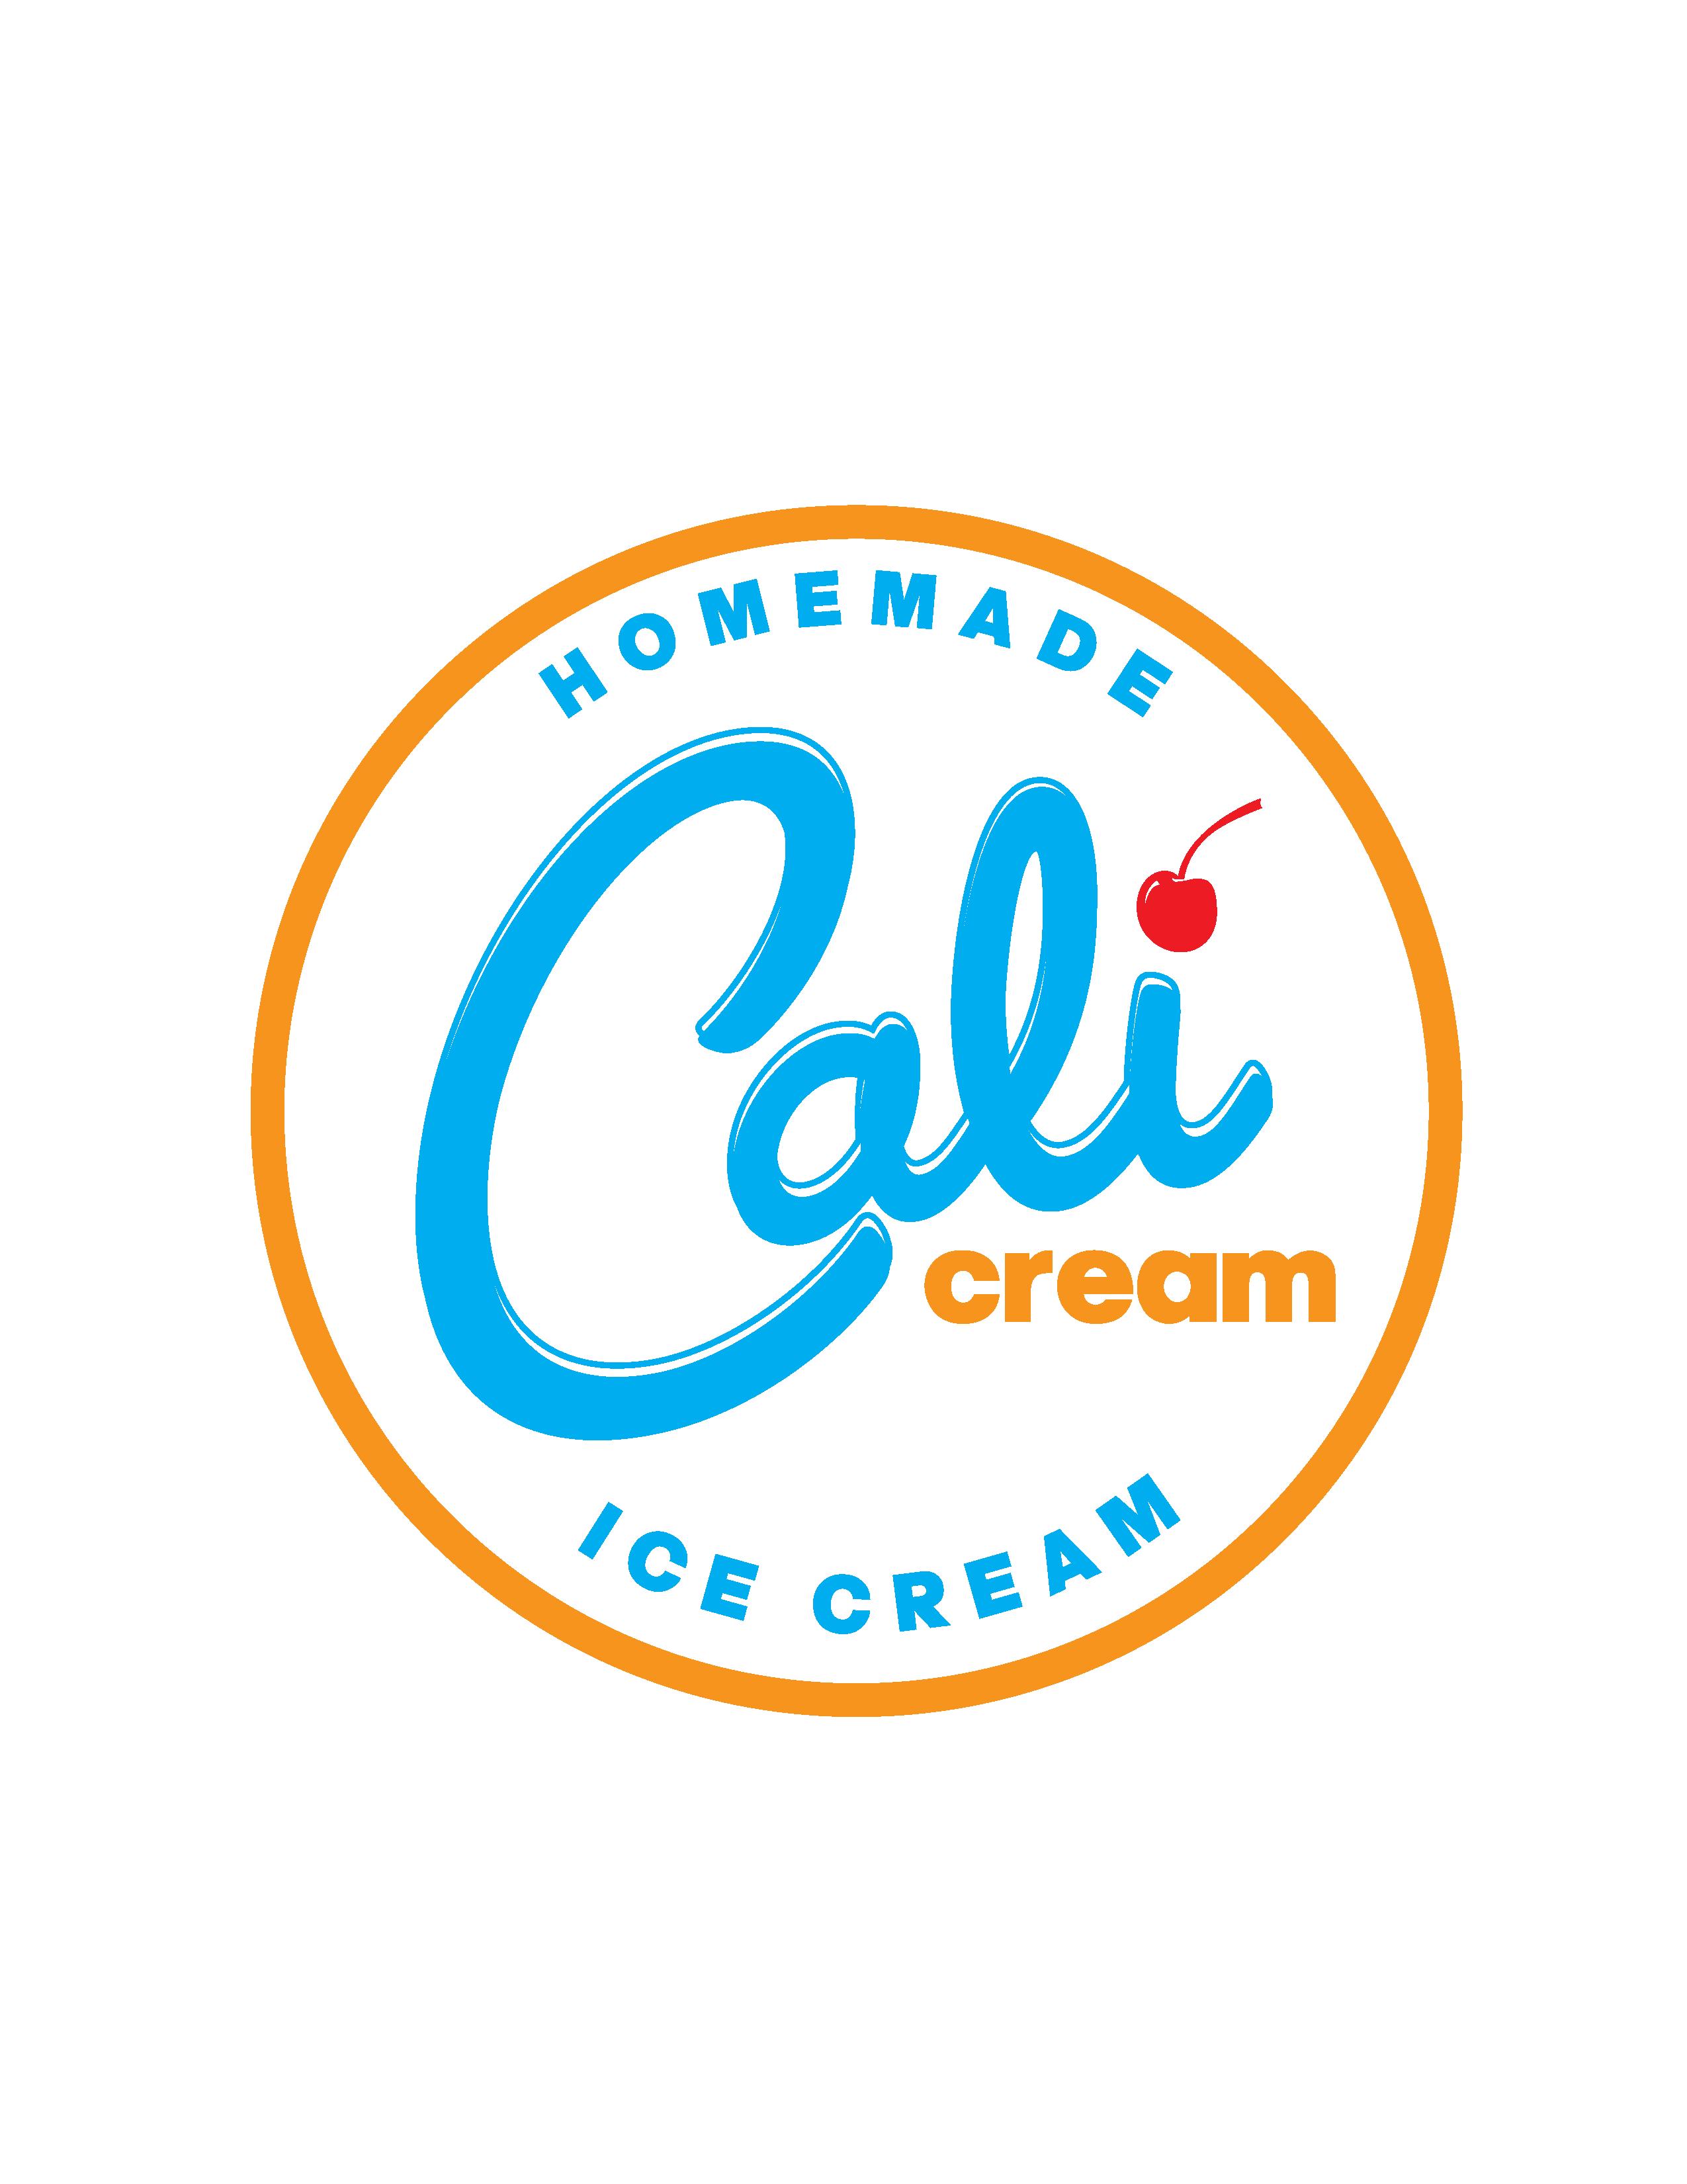 https://calicreamicecream.com/wp-content/uploads/2020/08/Cali-Cream-Final-04.png